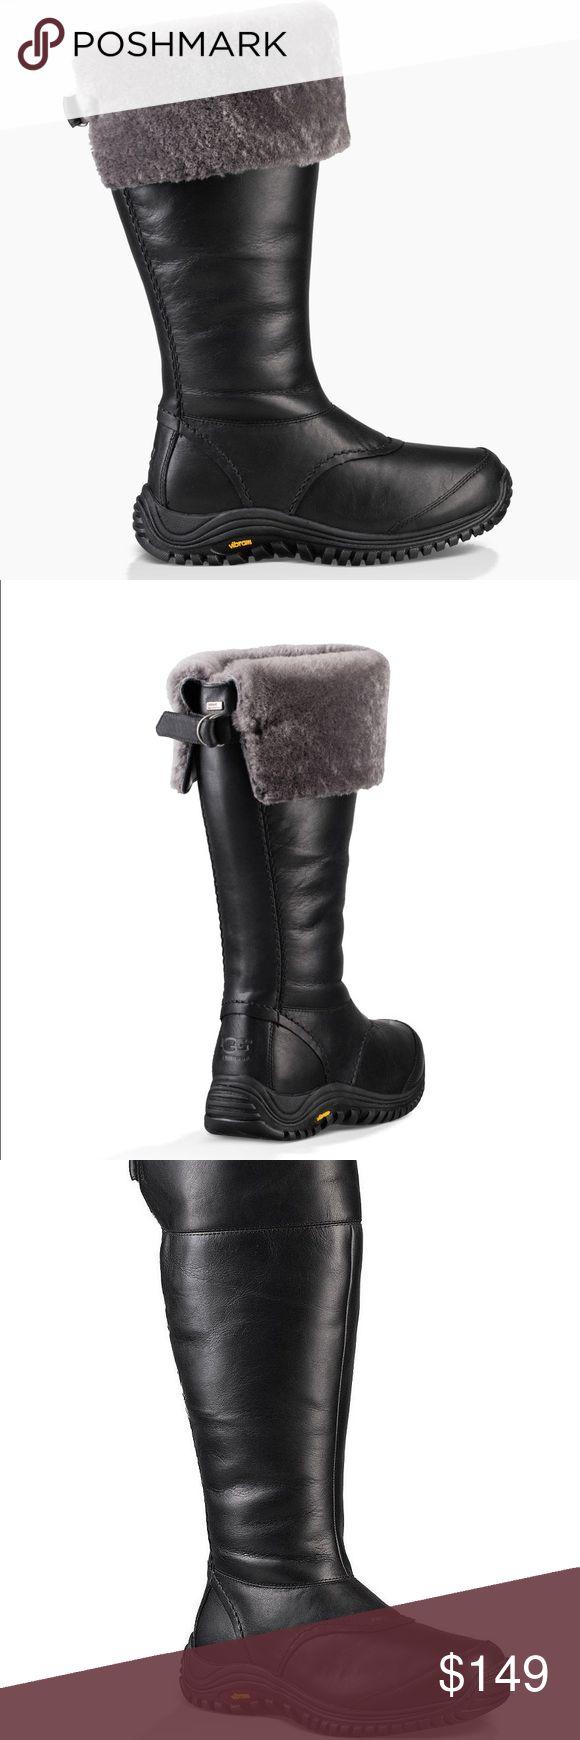 ugg miko boots mvcommission org rh mvcommission org